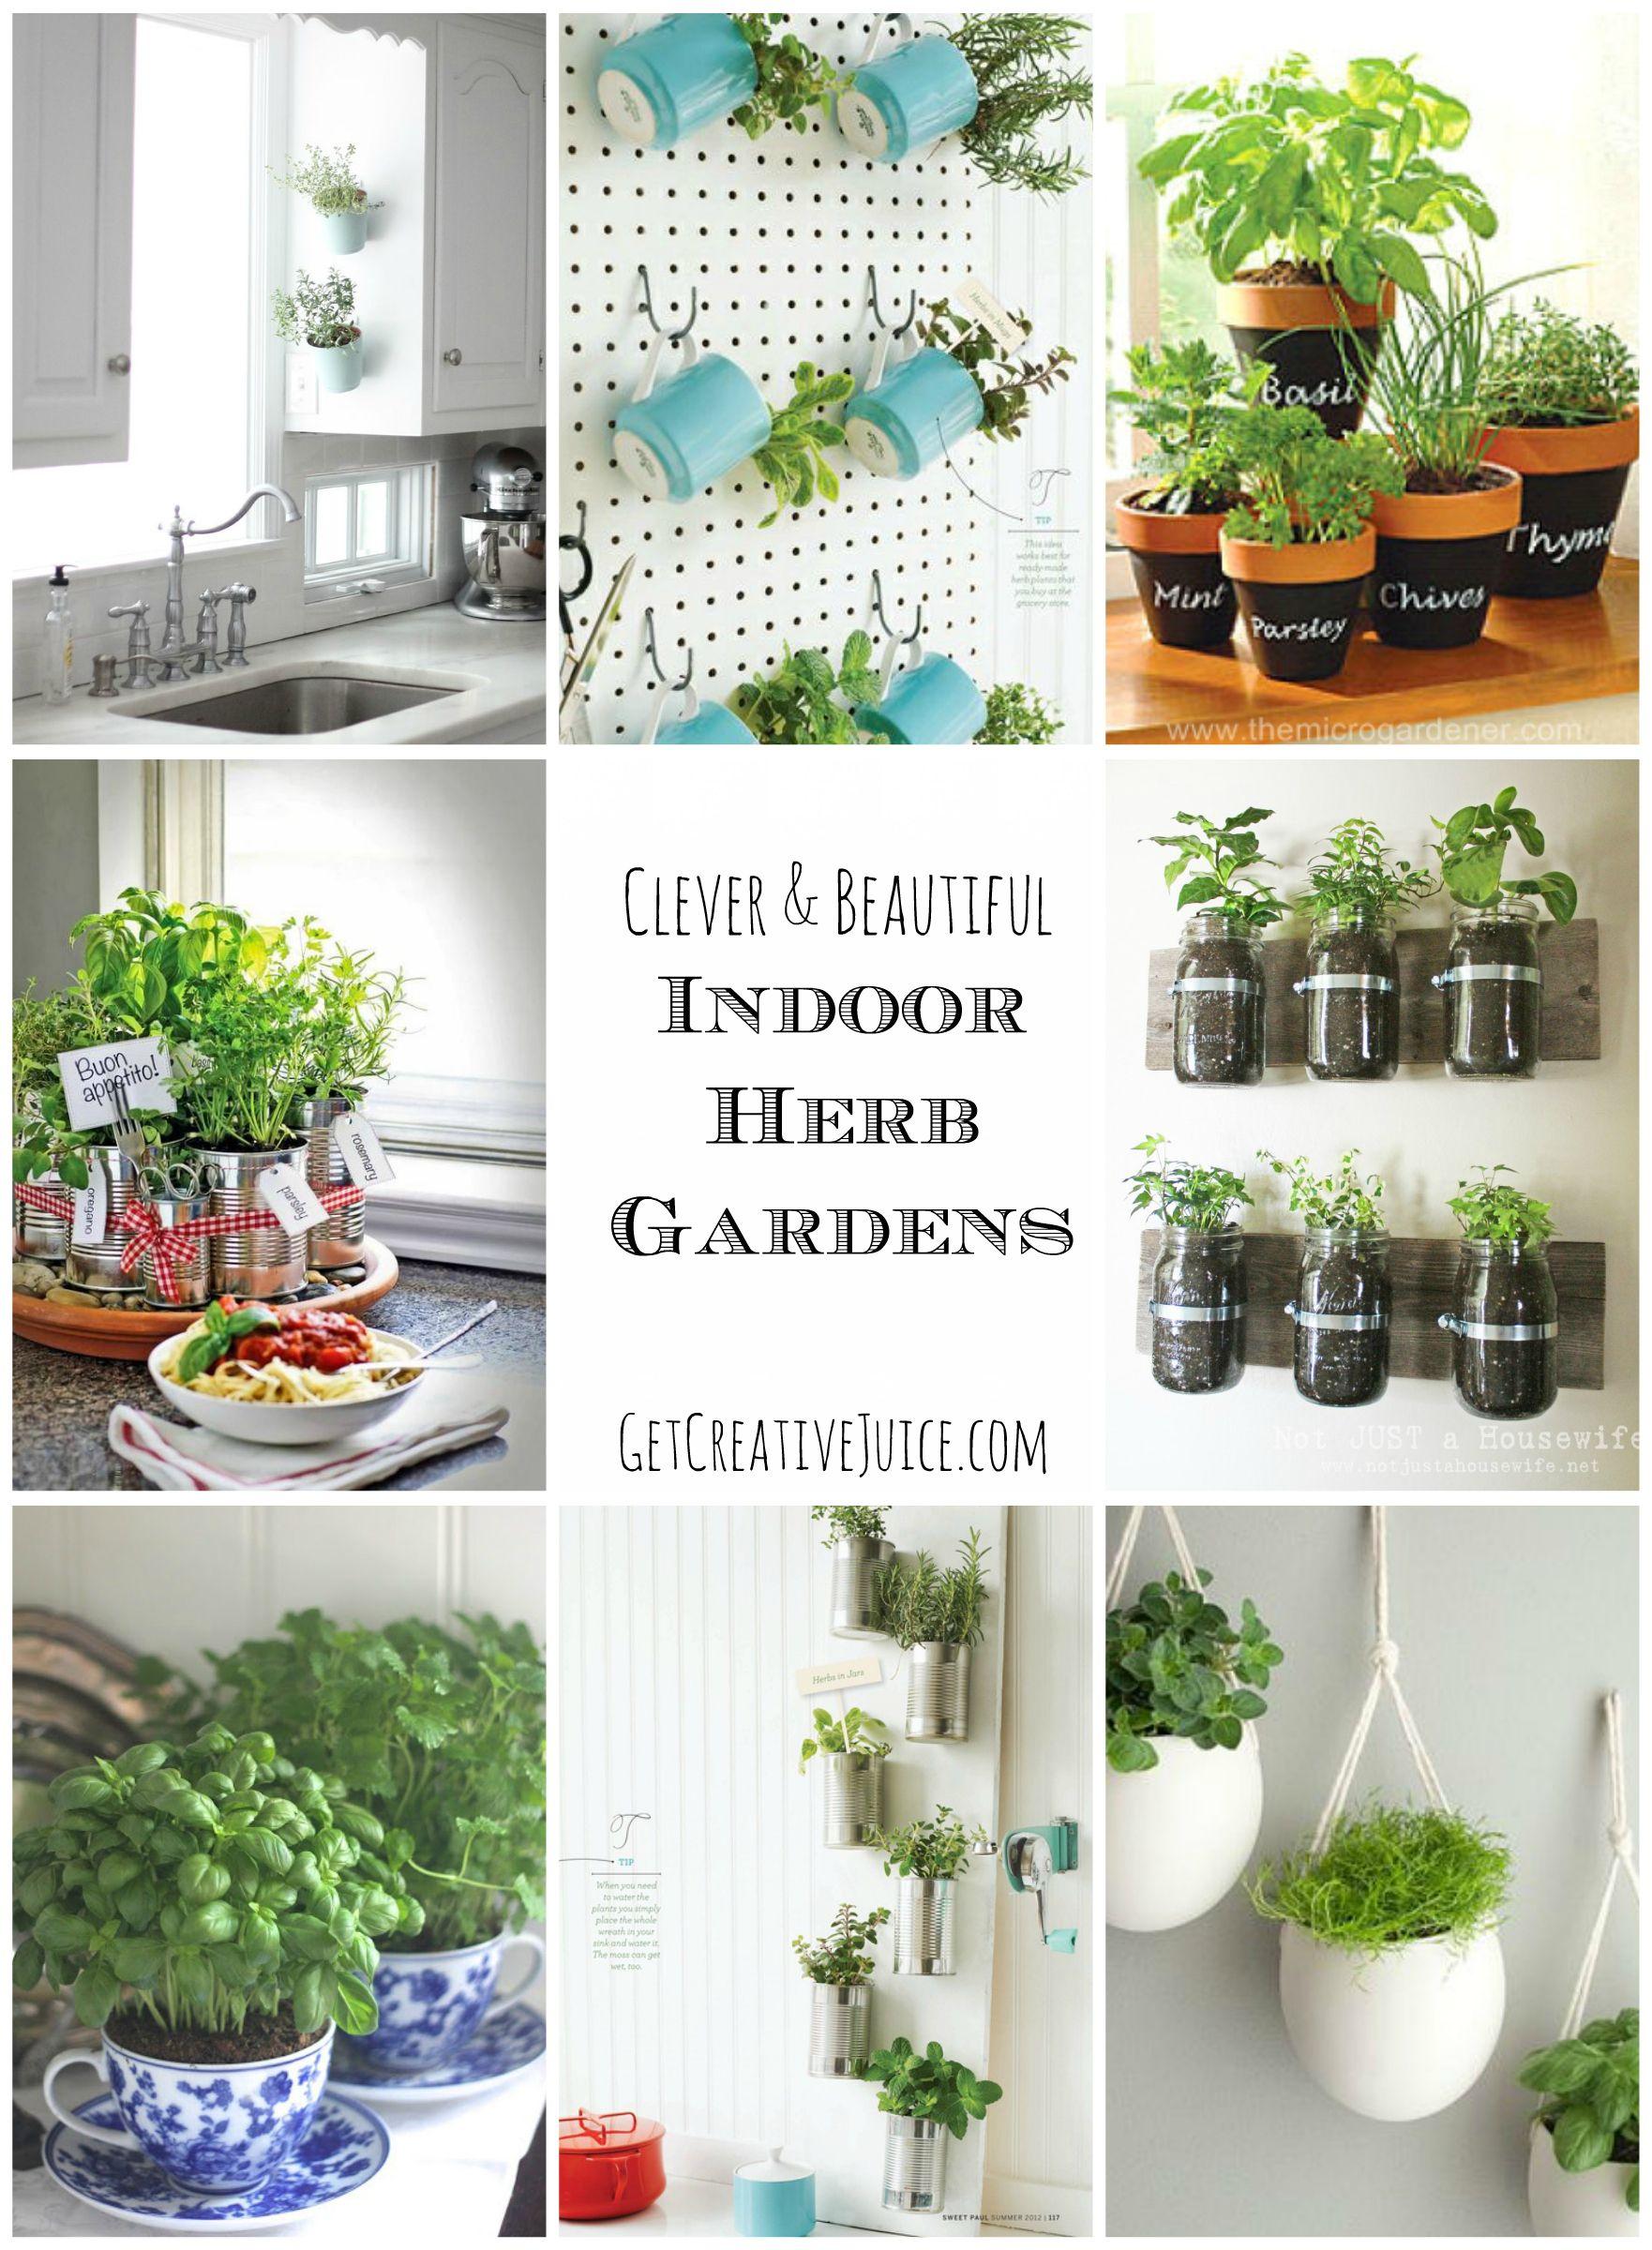 indoor herb garden ideas creative beautiful and easy ideas for growing an herb garden in on outdoor kitchen herb garden id=52281